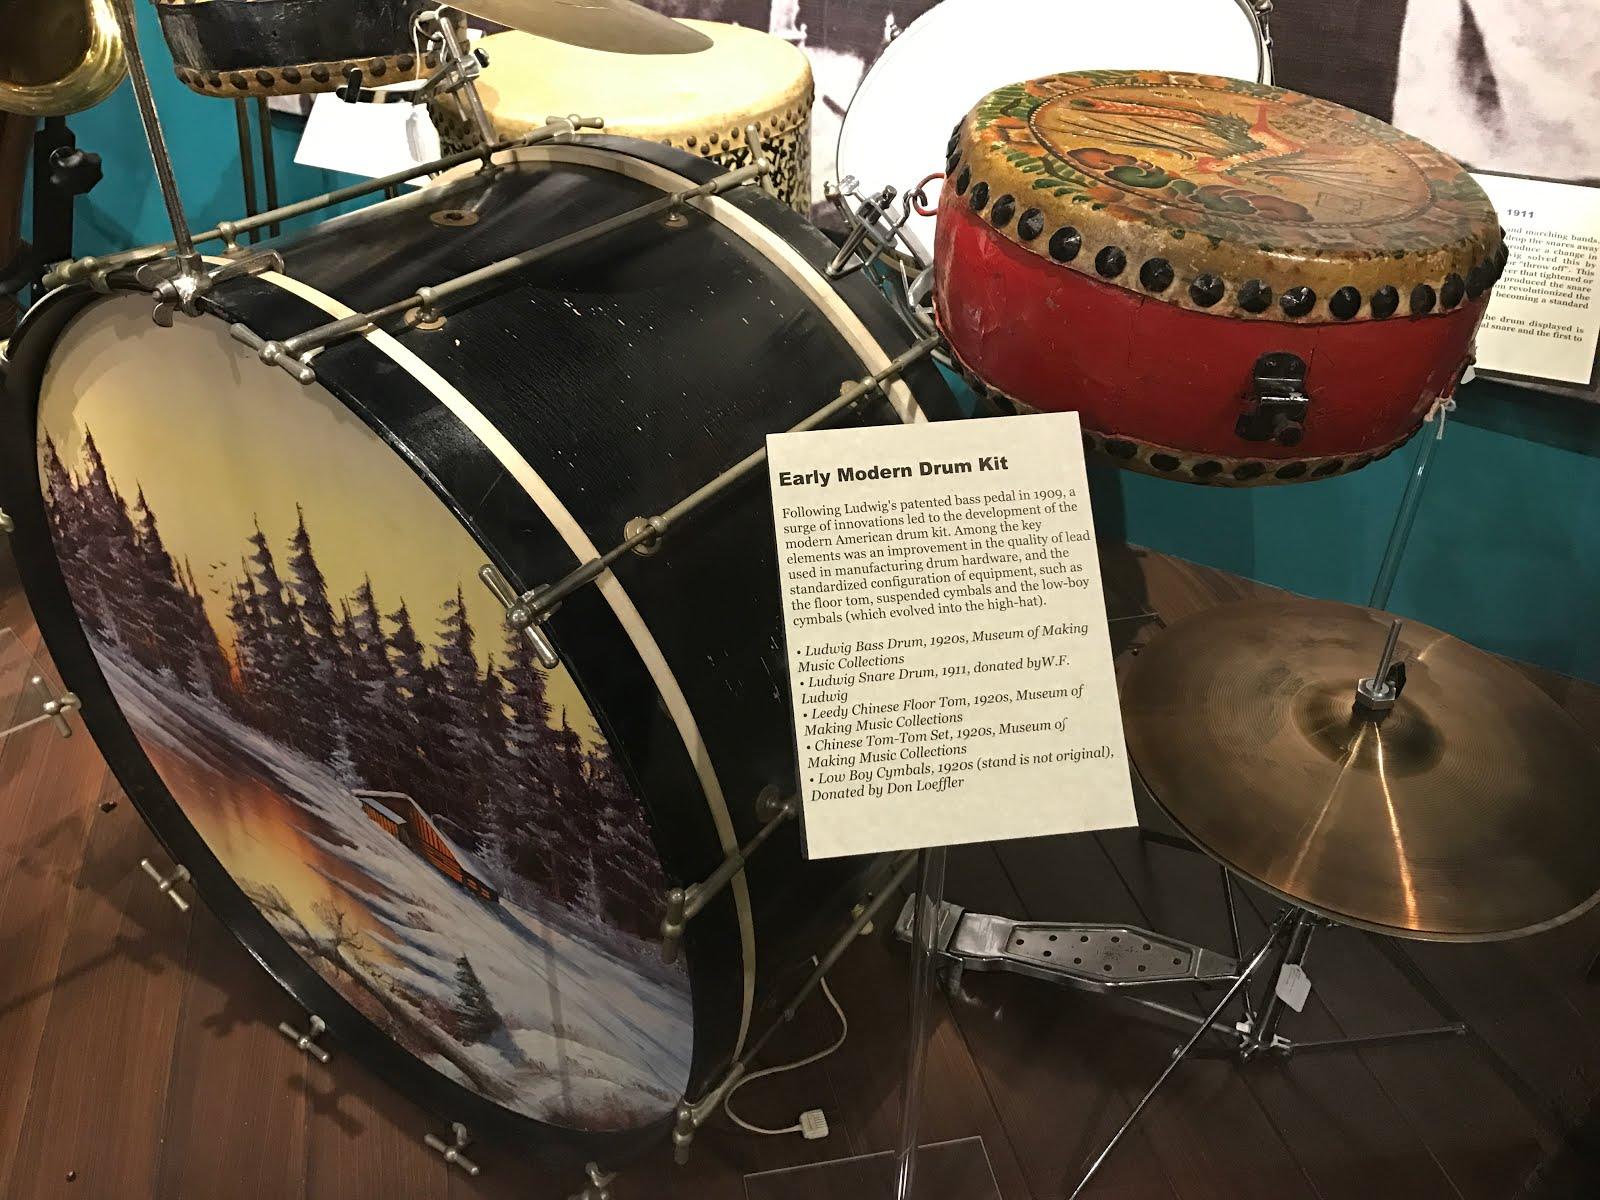 Museum Of Making Music - Carlsbad, CA